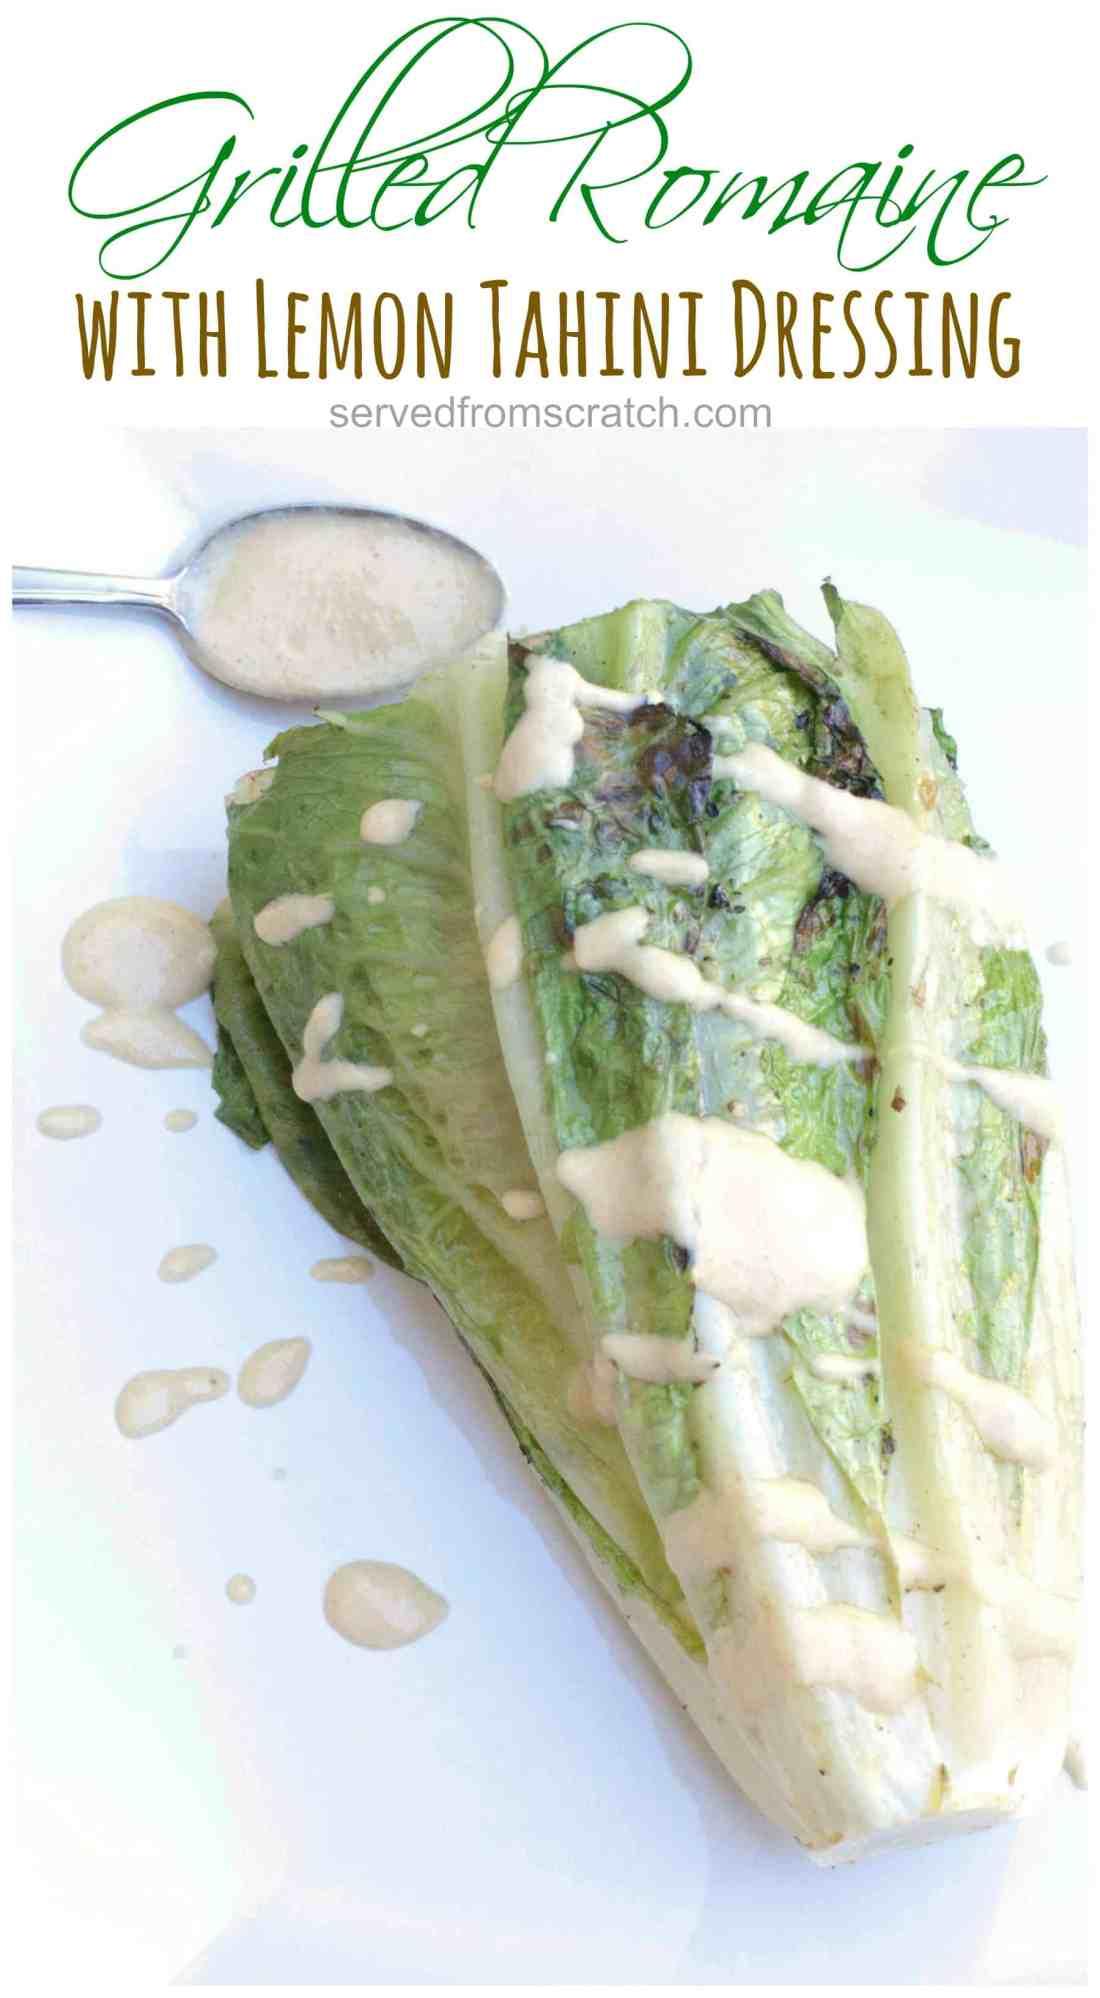 grilled-romaine-with-lemon-tahini-dressing